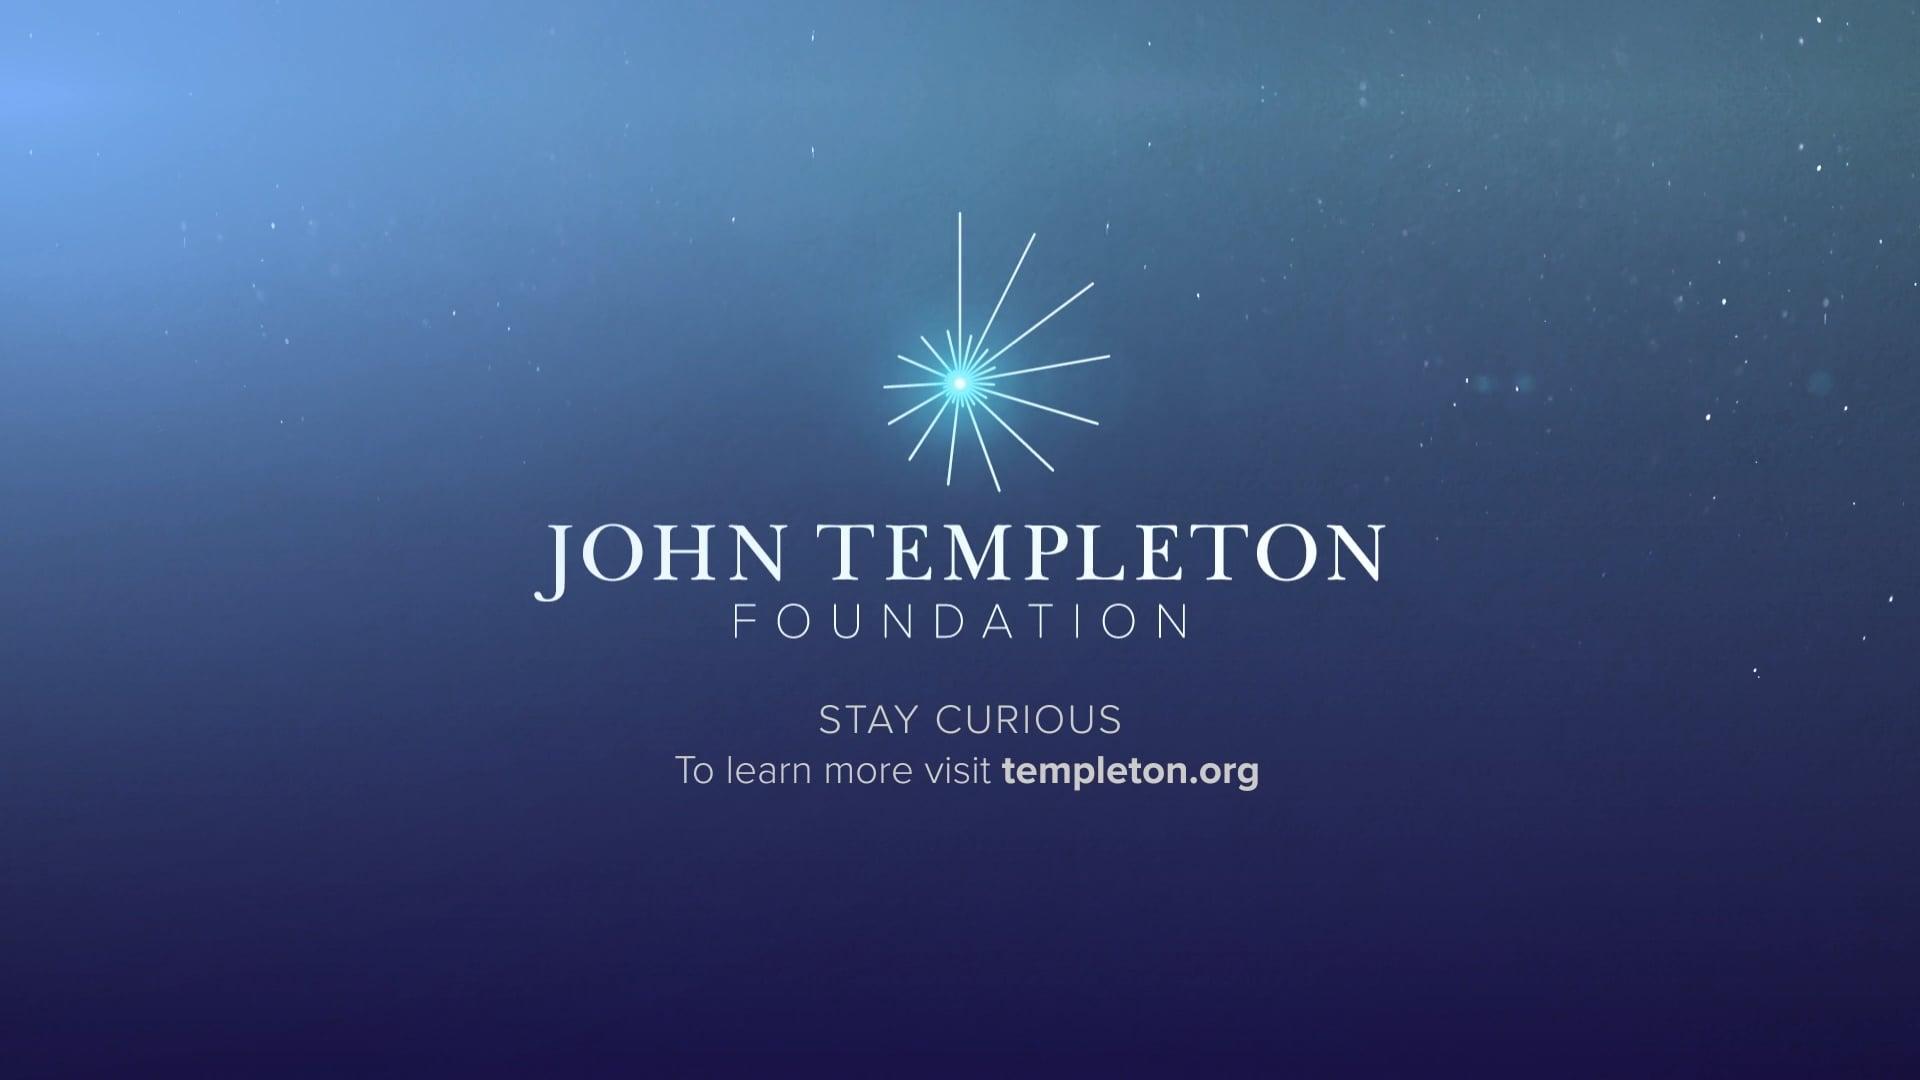 JOHN TEMPLETON FOUNDATION - PBS Bumper